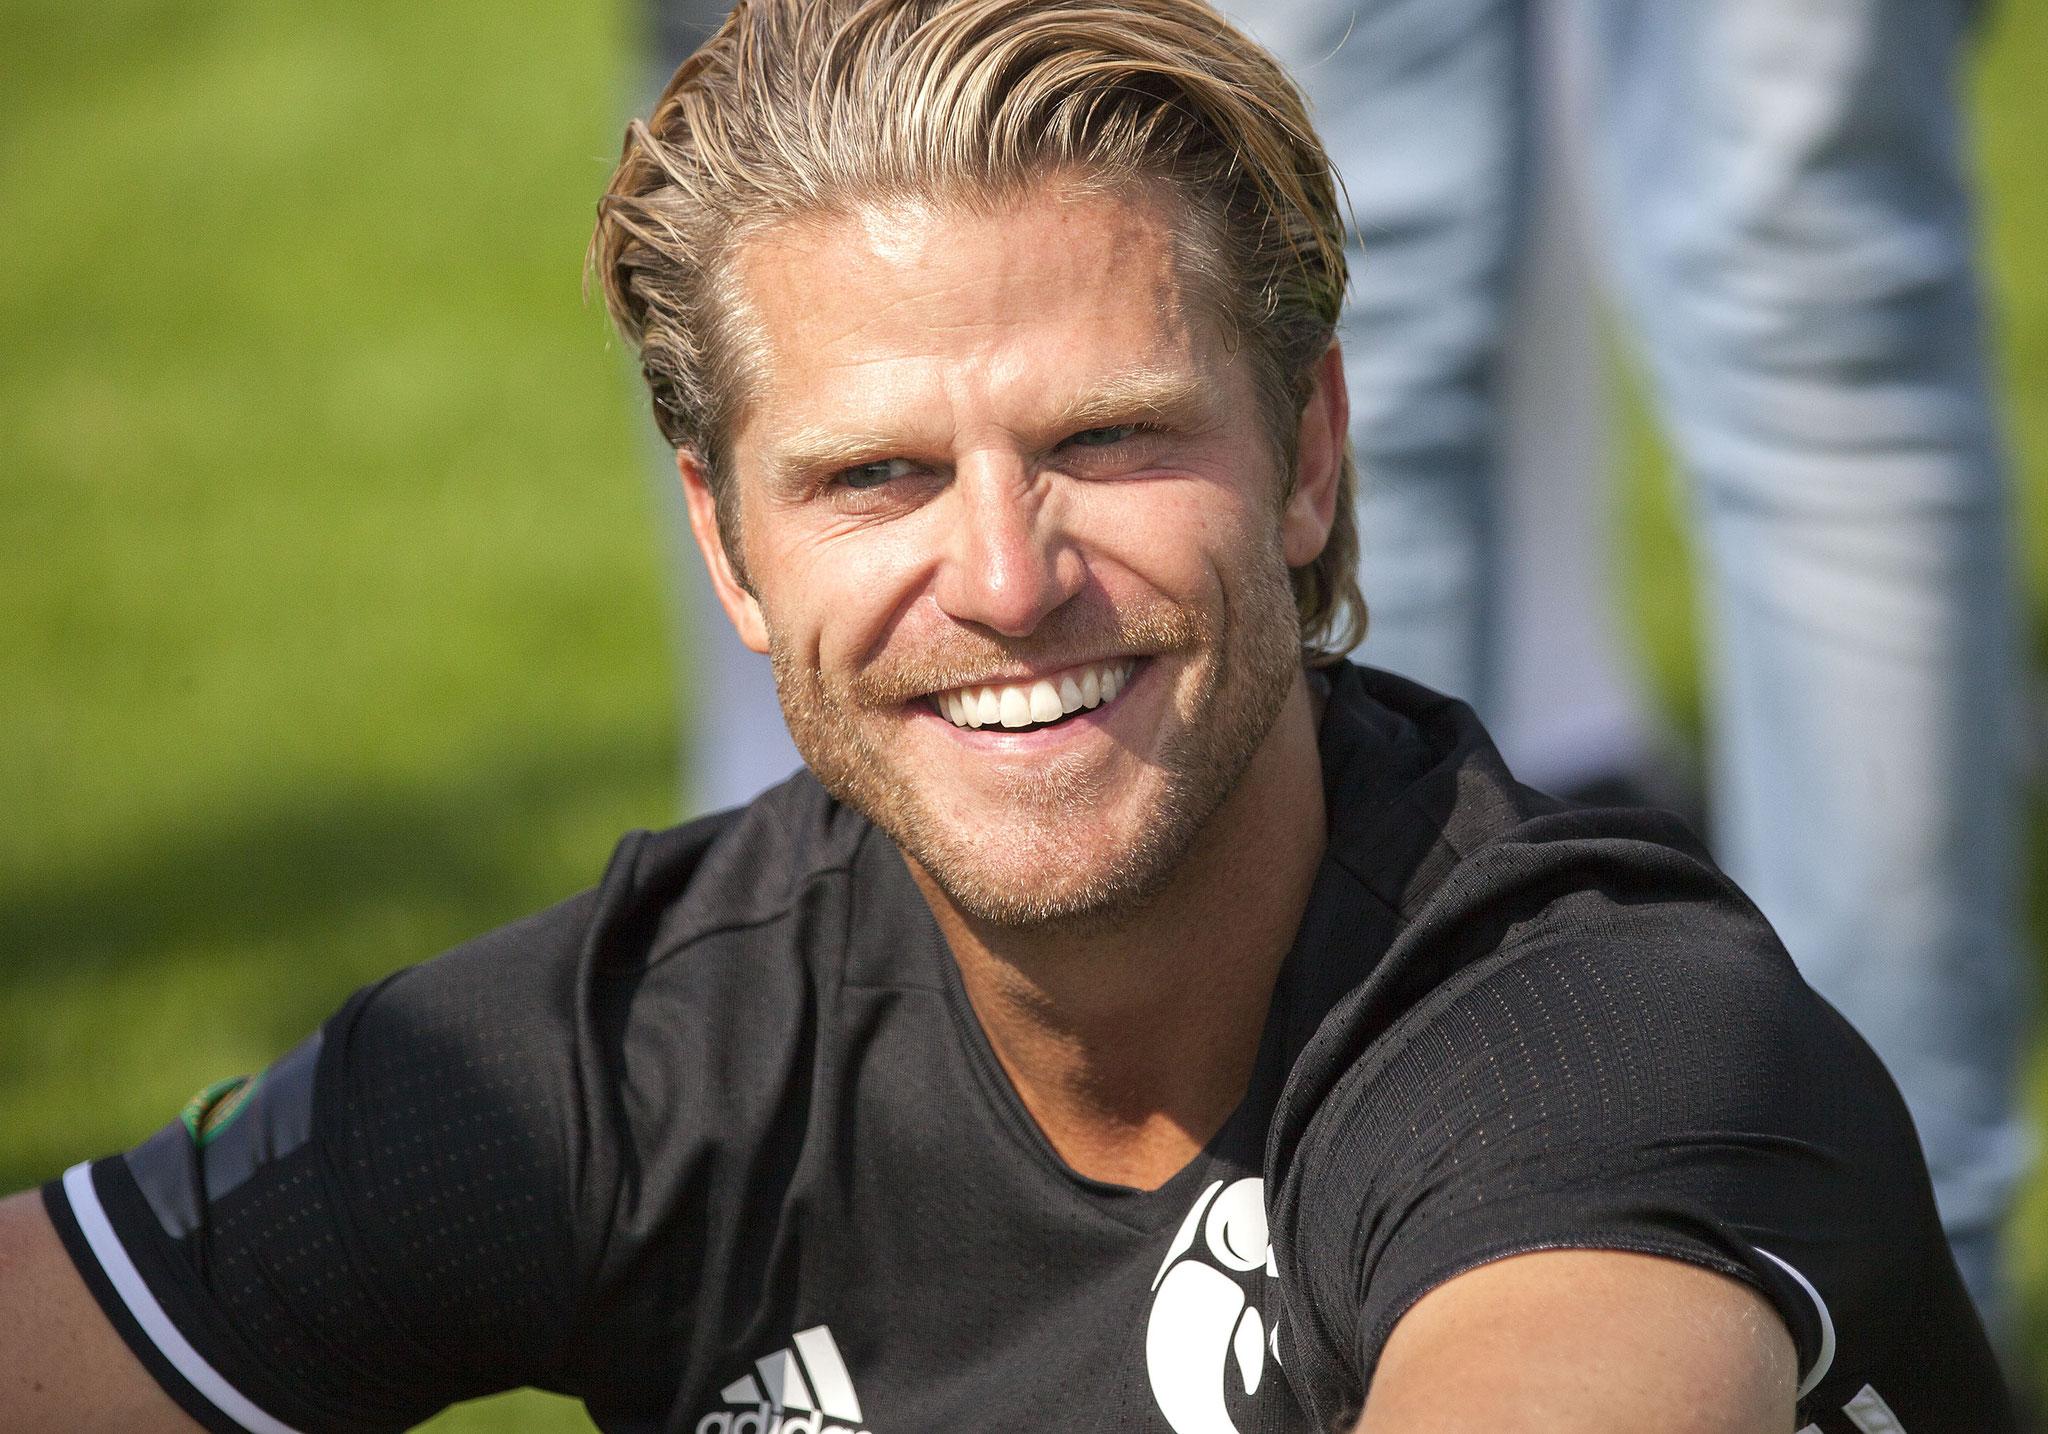 Paul Janke (Bachelor)